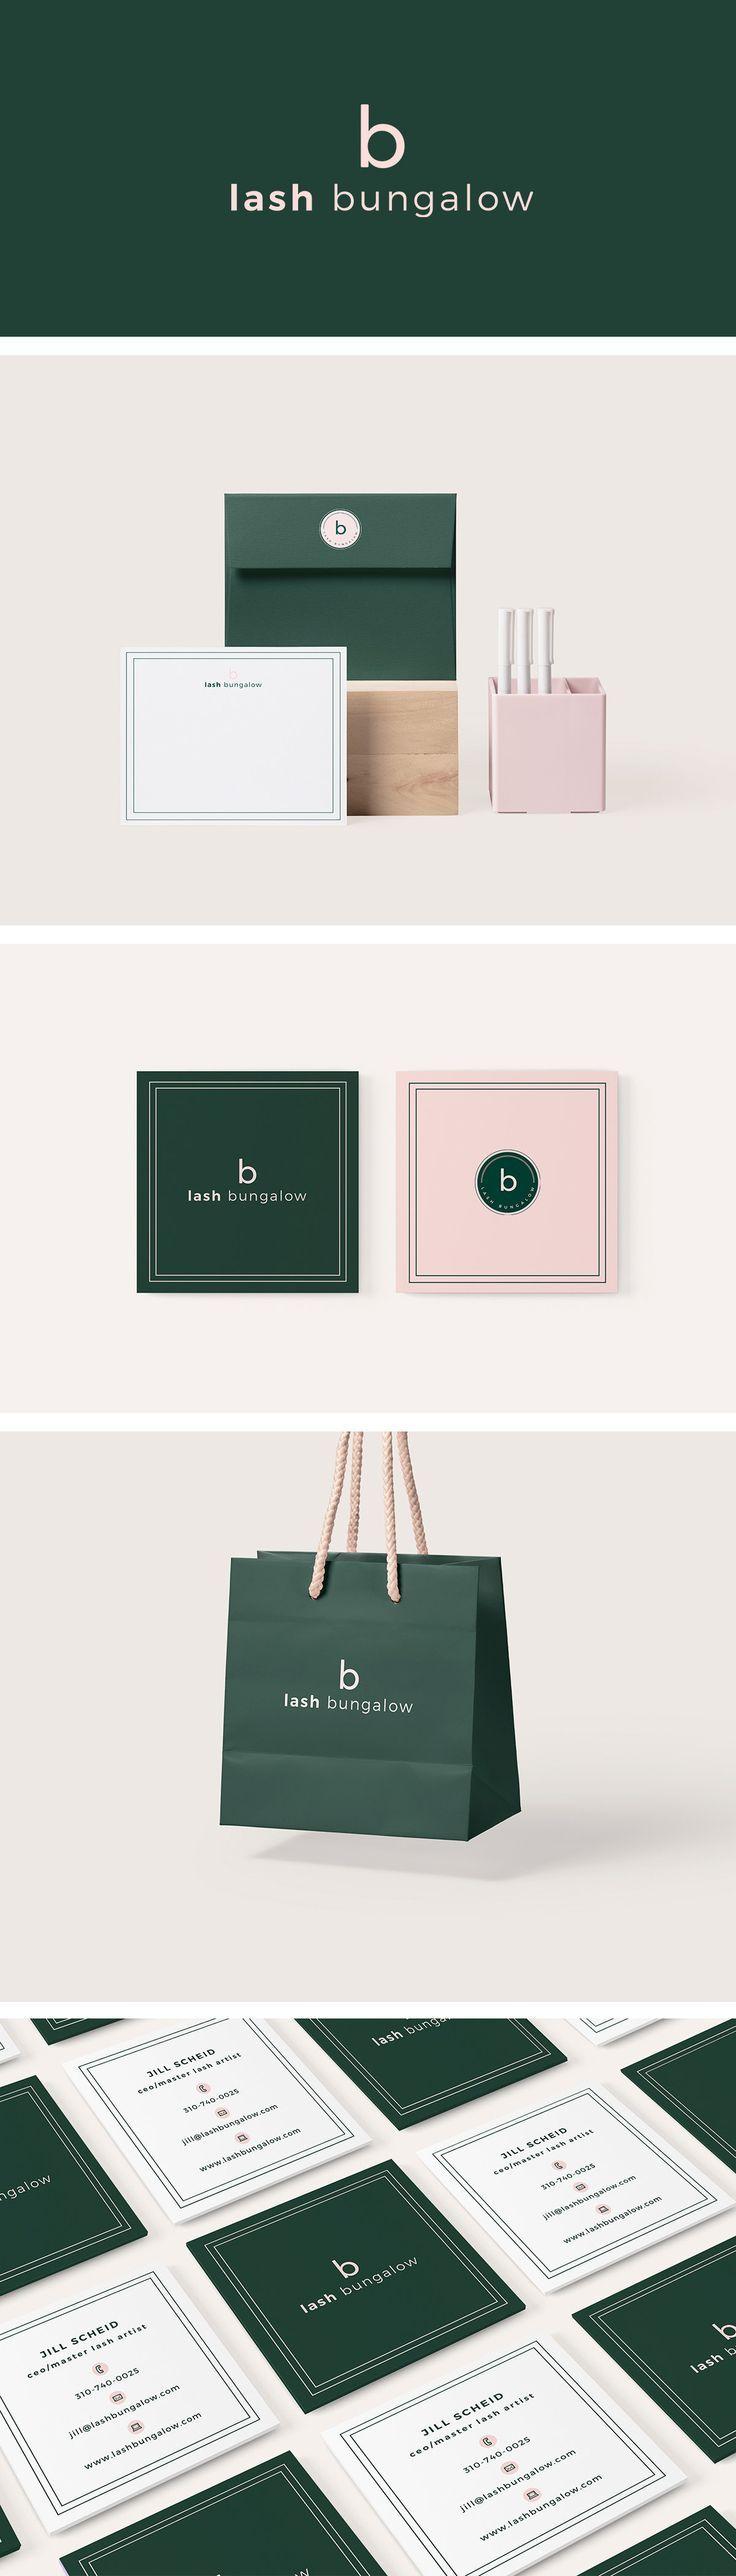 Lash Bungalow Branding - graphic design, branding, logo design, feminine design, web design, blog design, #graphicdesign, #designinspiration, #branding, #logodesign #brandingidentity